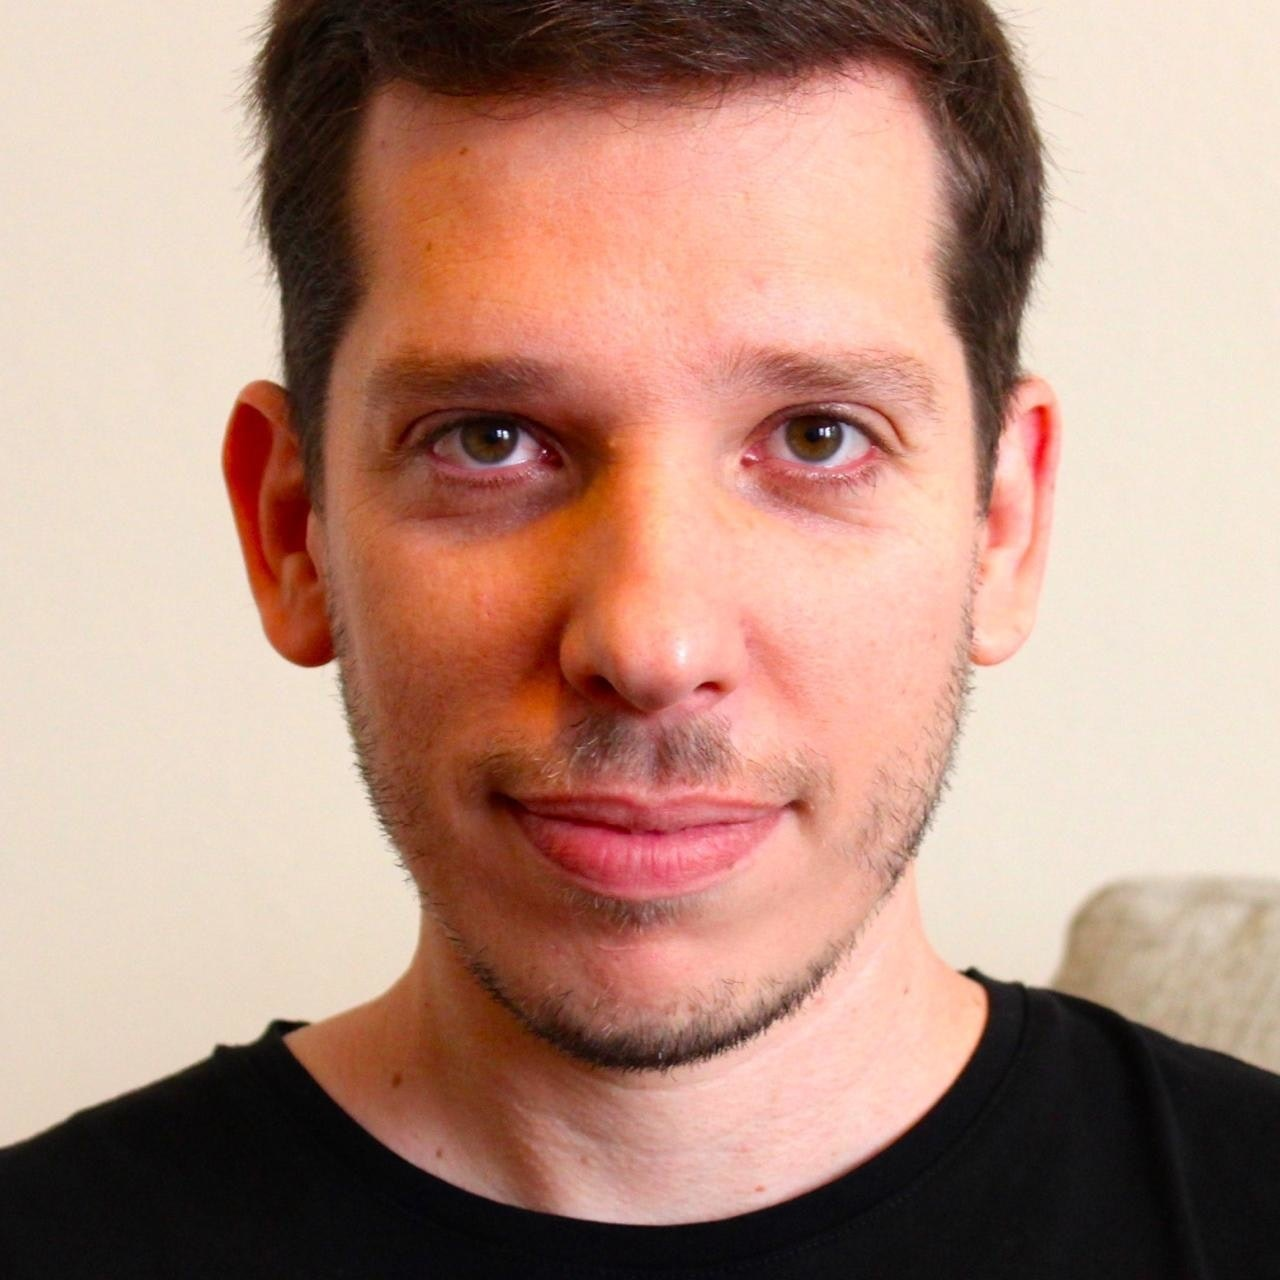 Pedro Valente